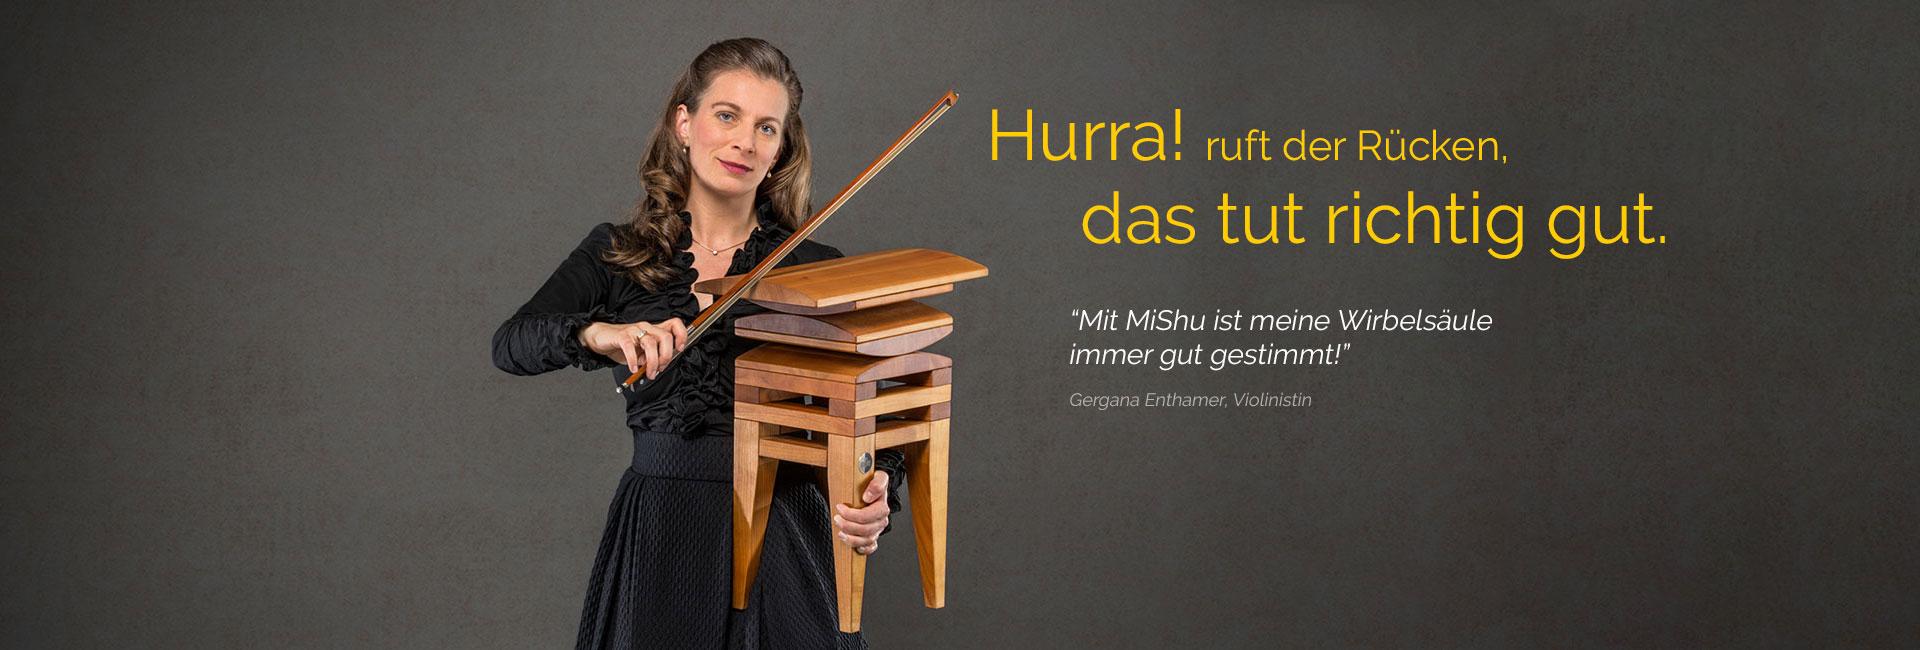 Musikerstuhl